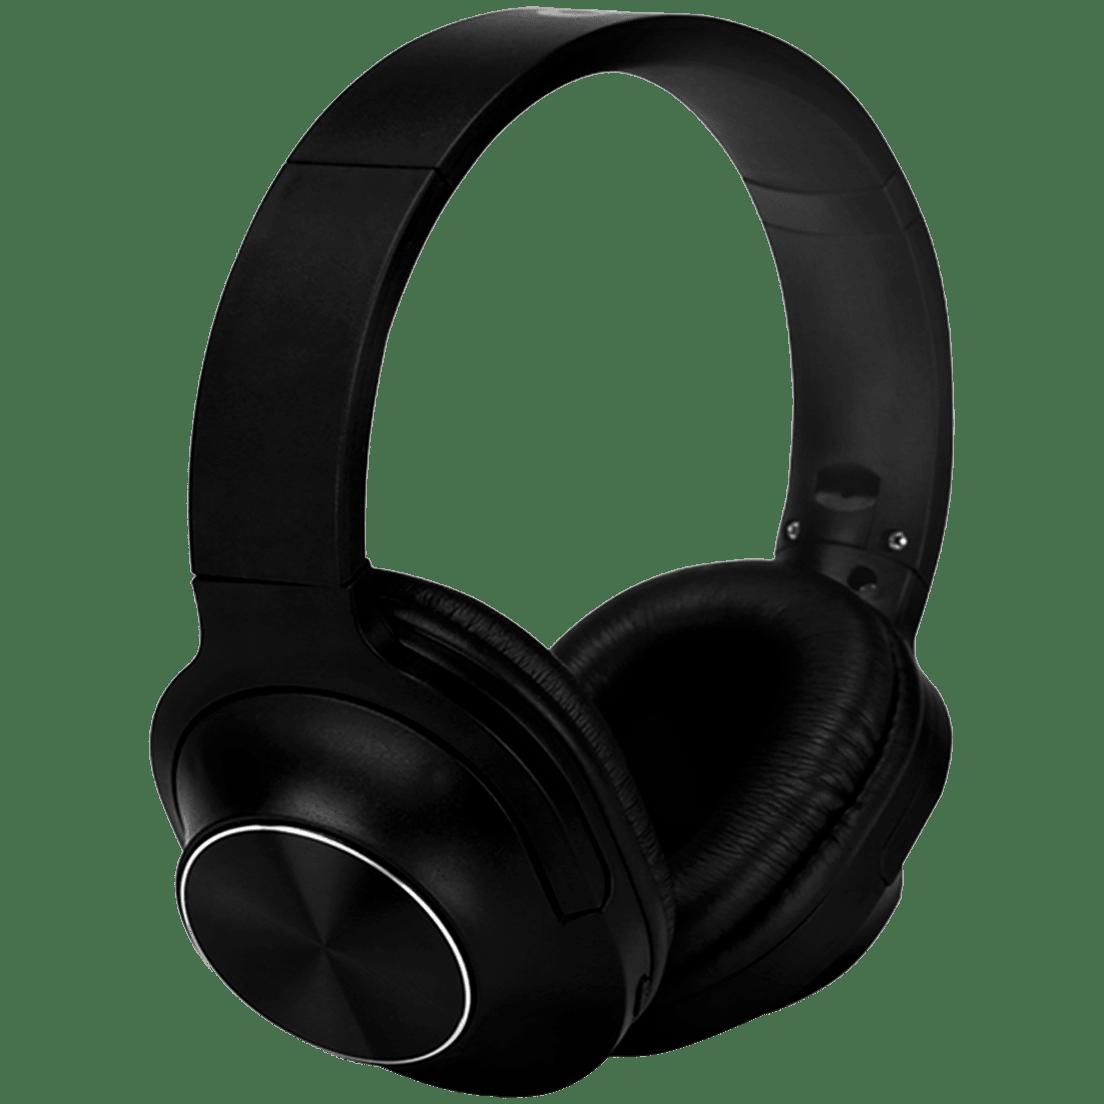 f2e3574eca0 QFX Foldable Over-Ear Bluetooth Headphones